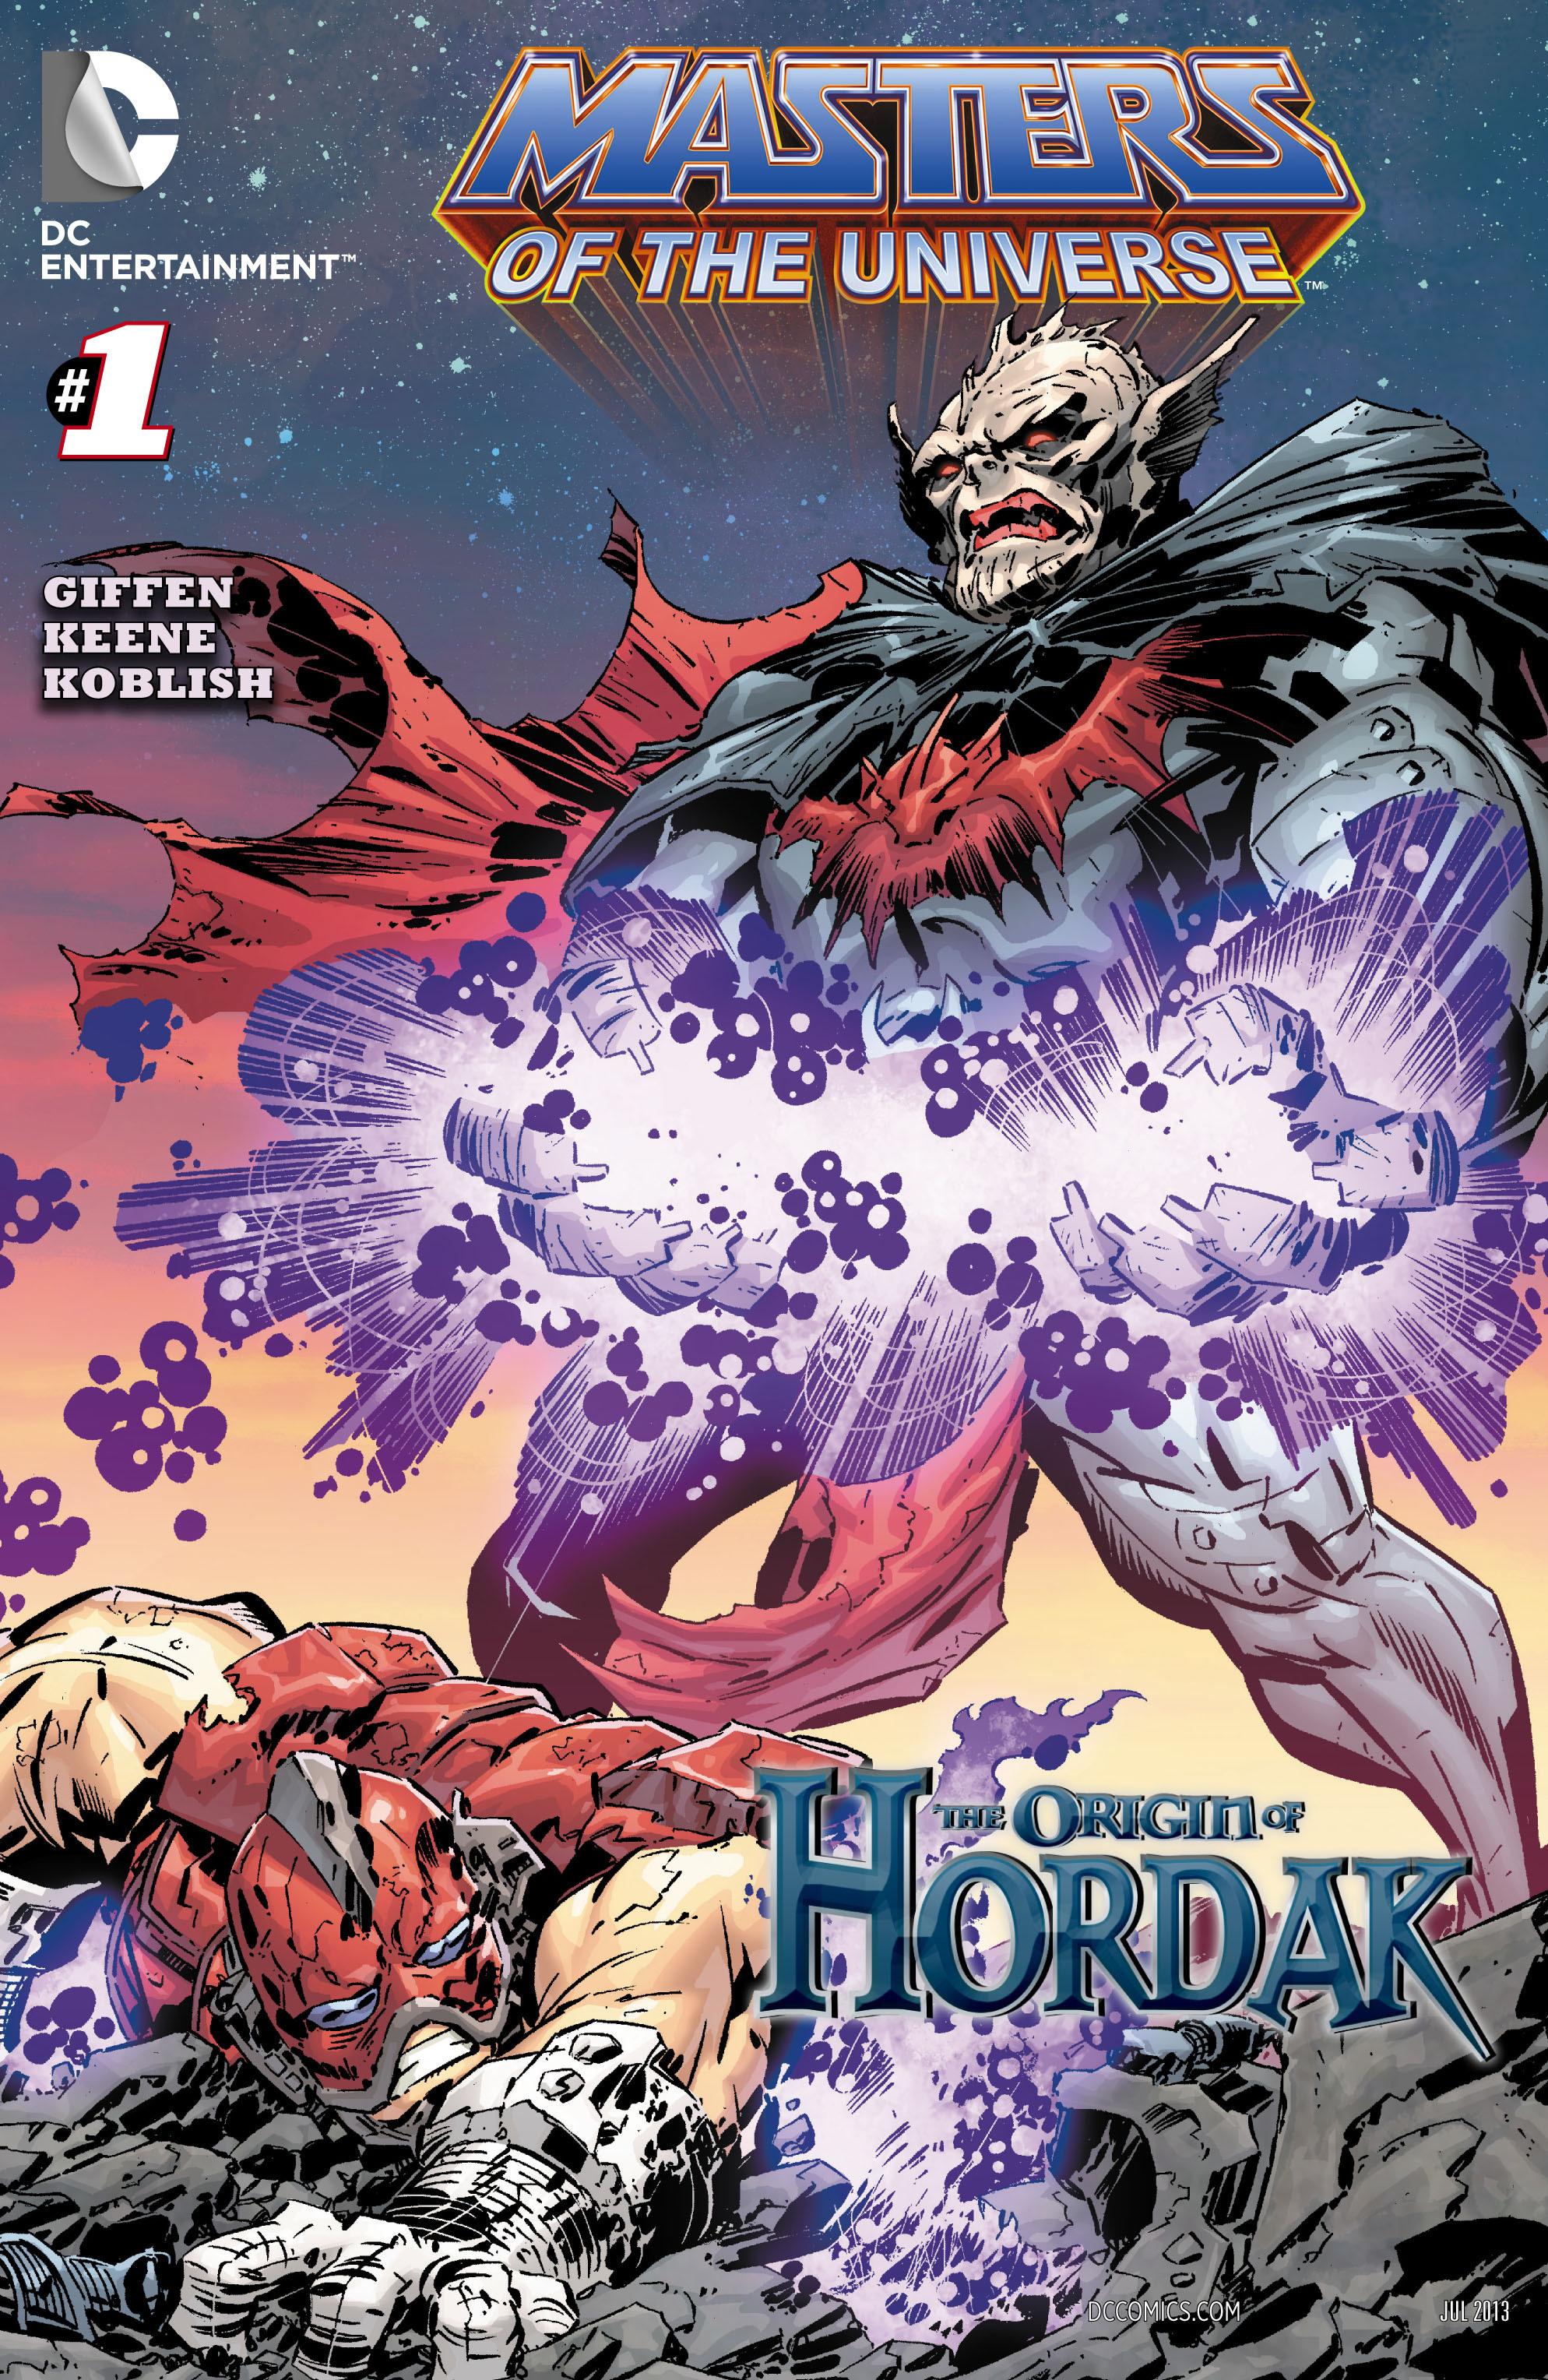 Masters Of The Universe: The Origin Of Hordak